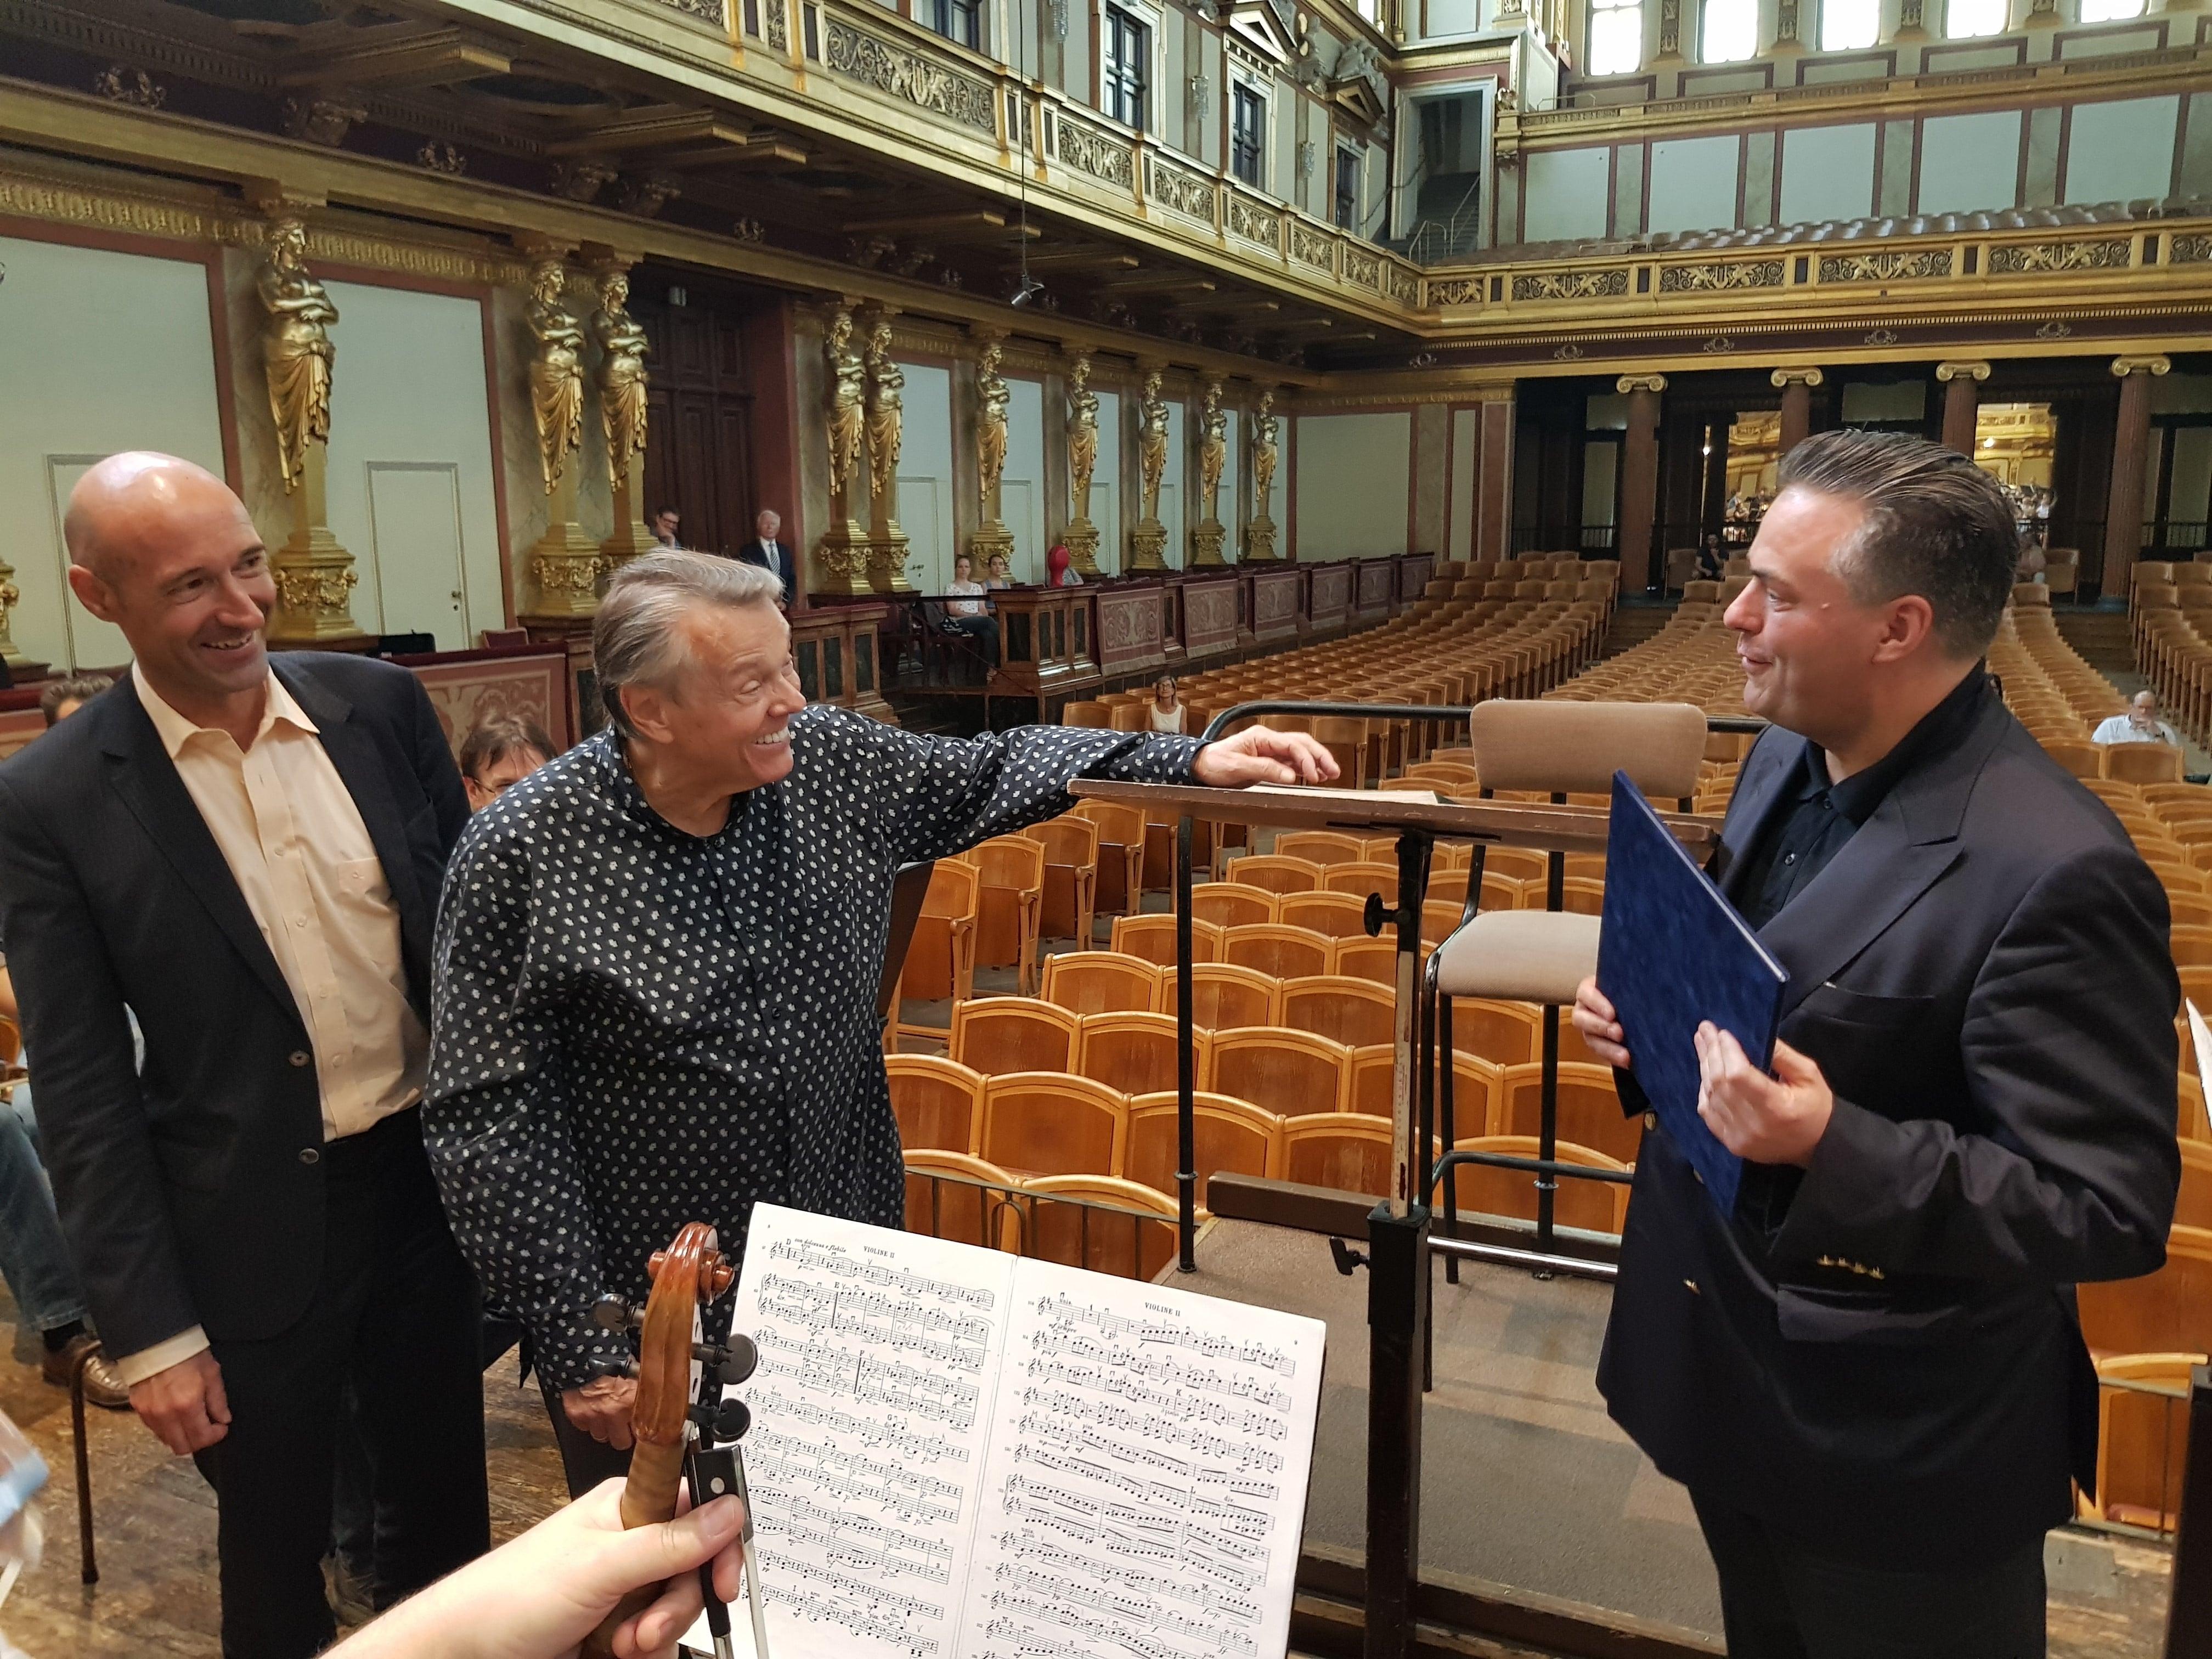 Vienna Philharmonic makes Mariss Jansons an honorary member